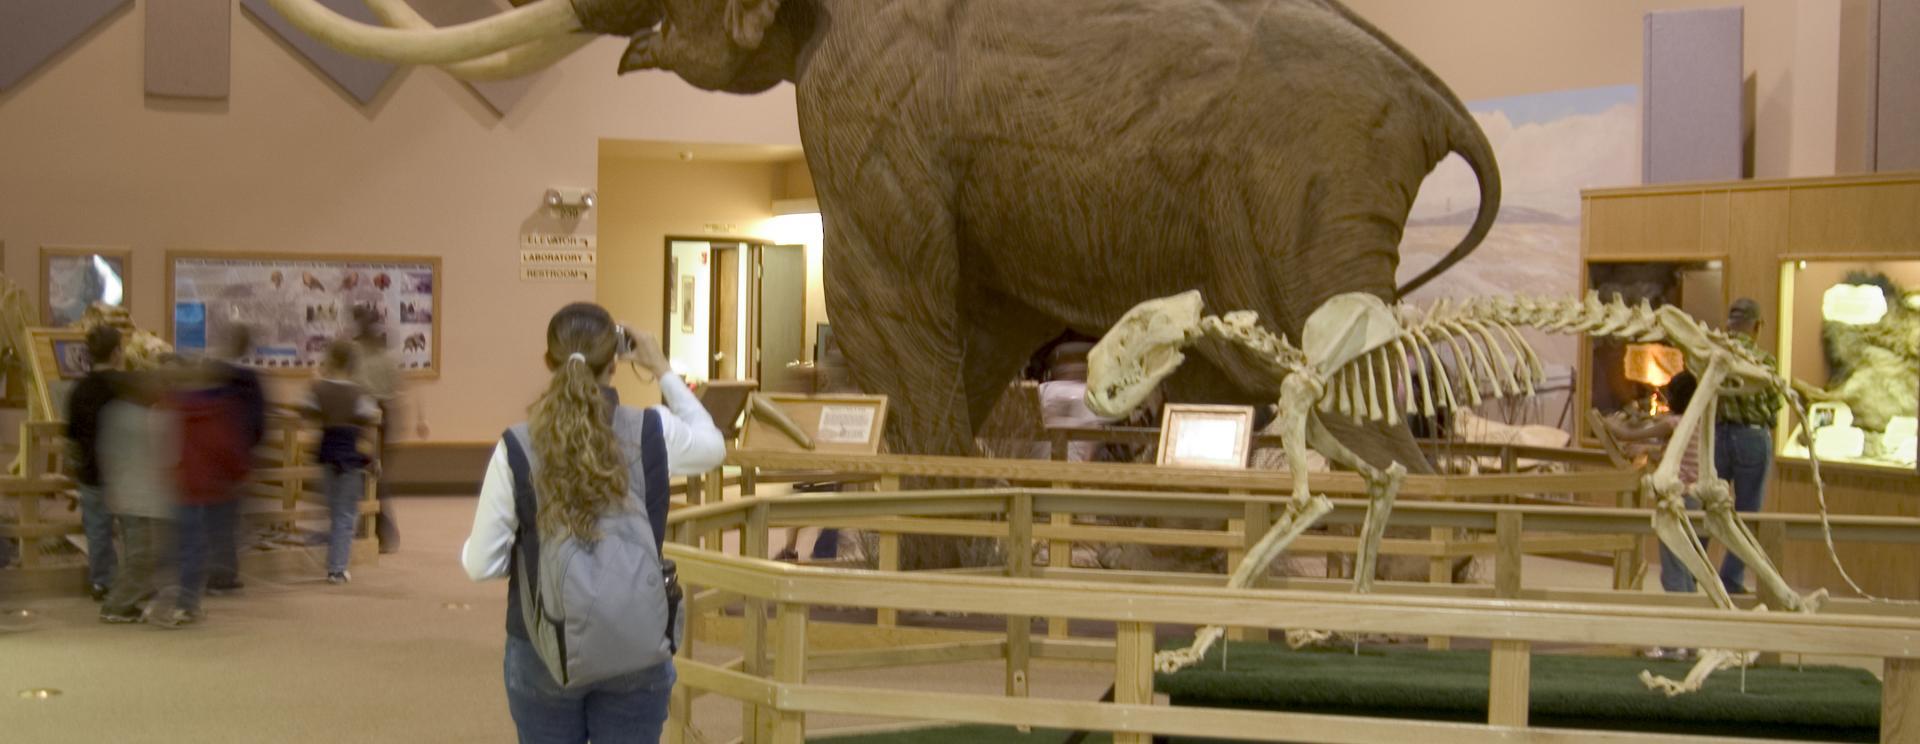 Mammoth Site